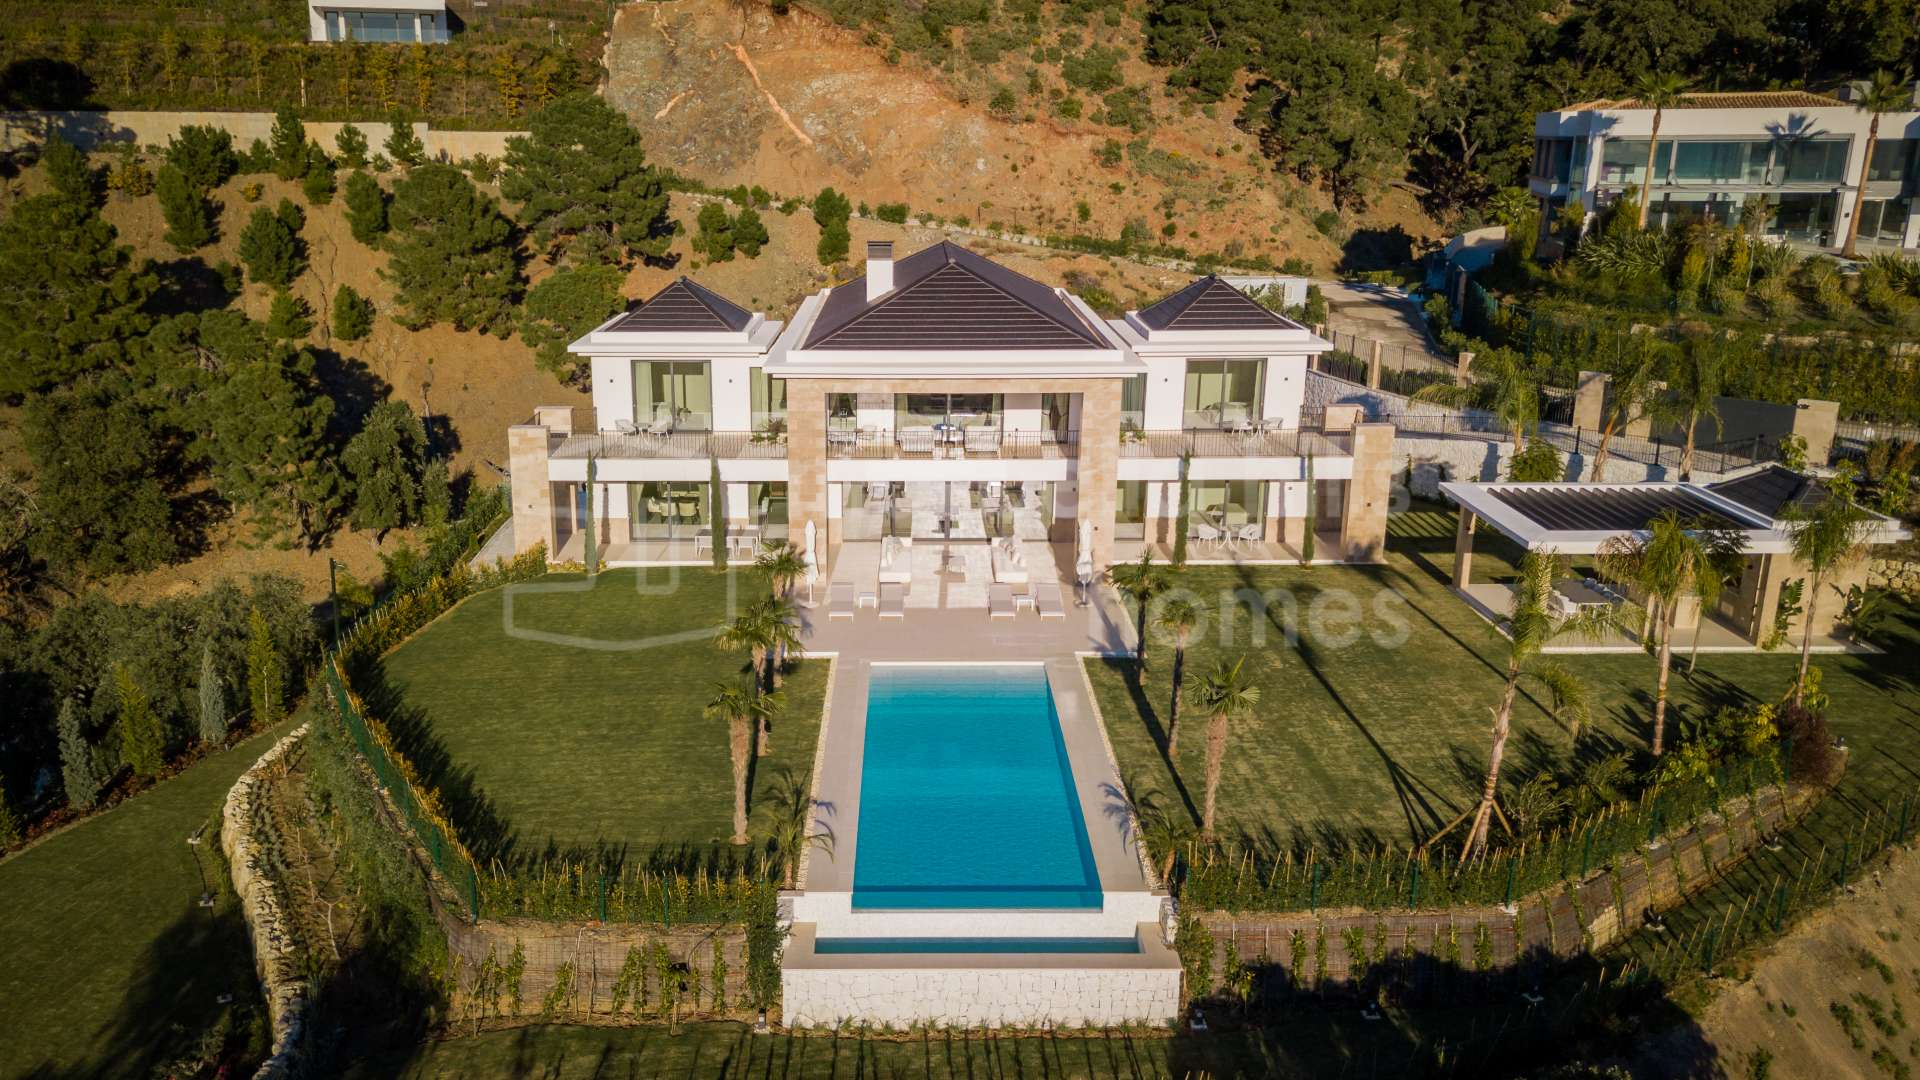 Exceptional 7 Bedroom Villa With Panoramic Views In La Zagaleta Benahavis